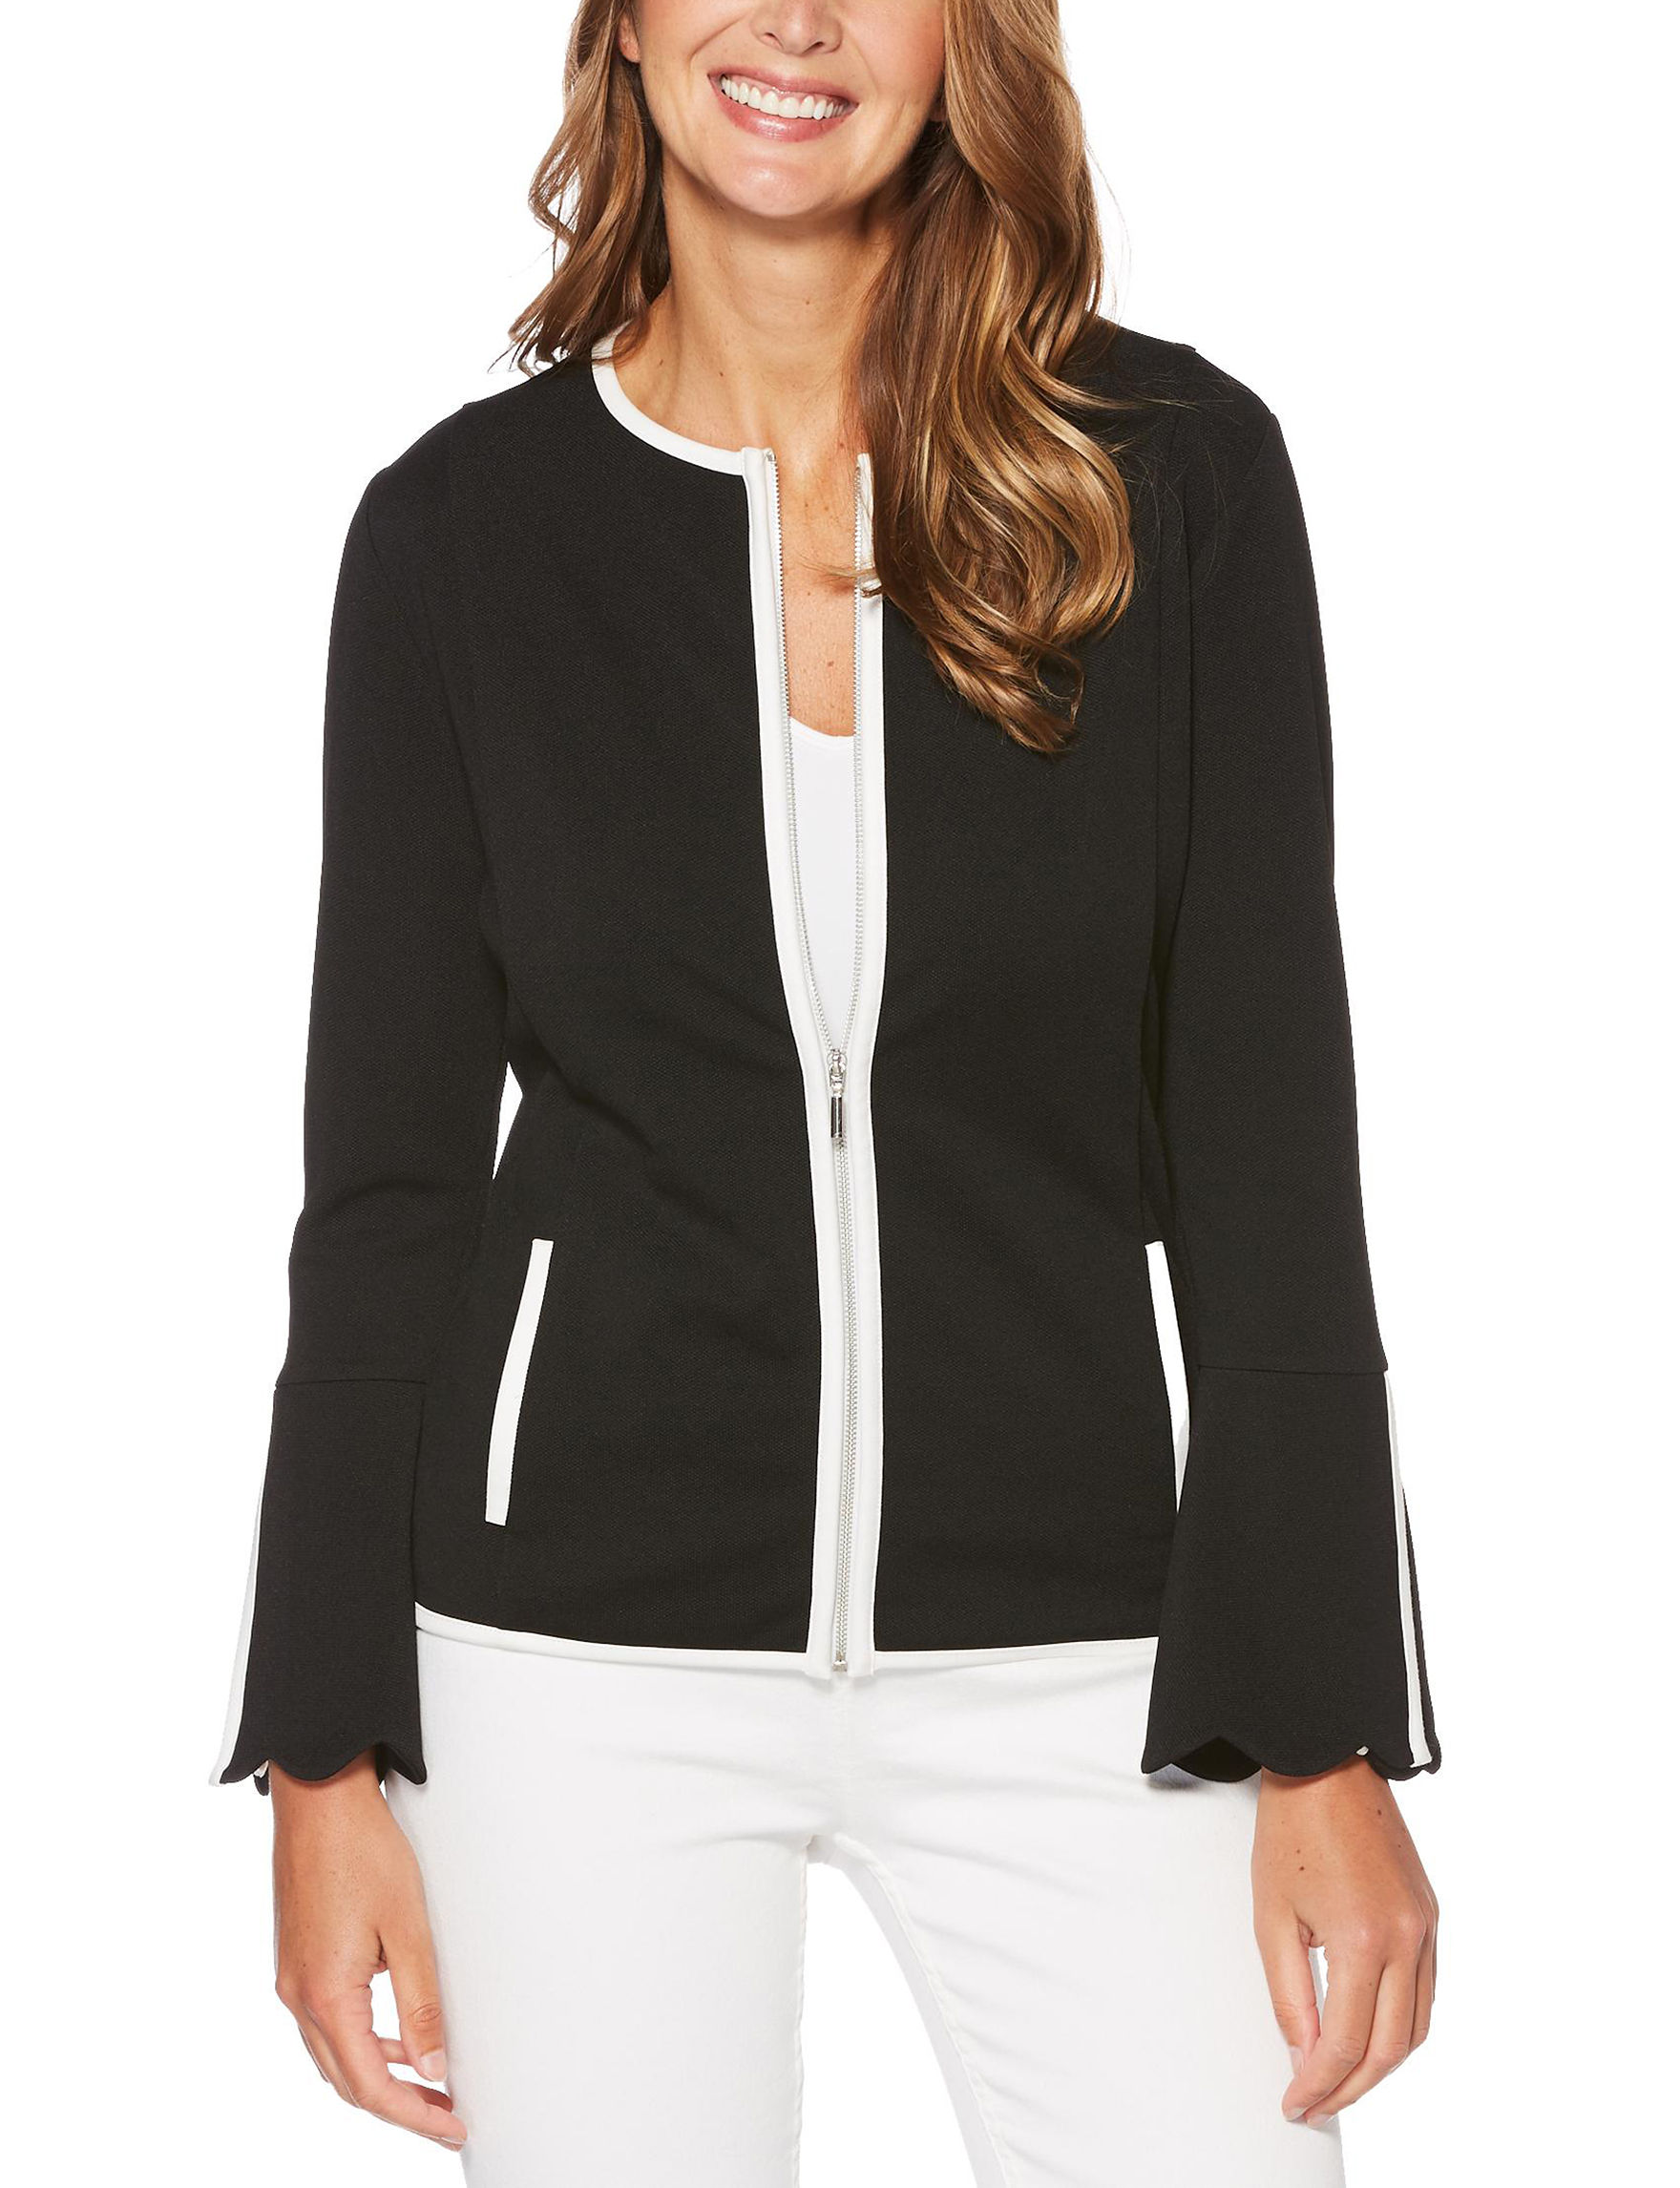 Rafaella Black Lightweight Jackets & Blazers